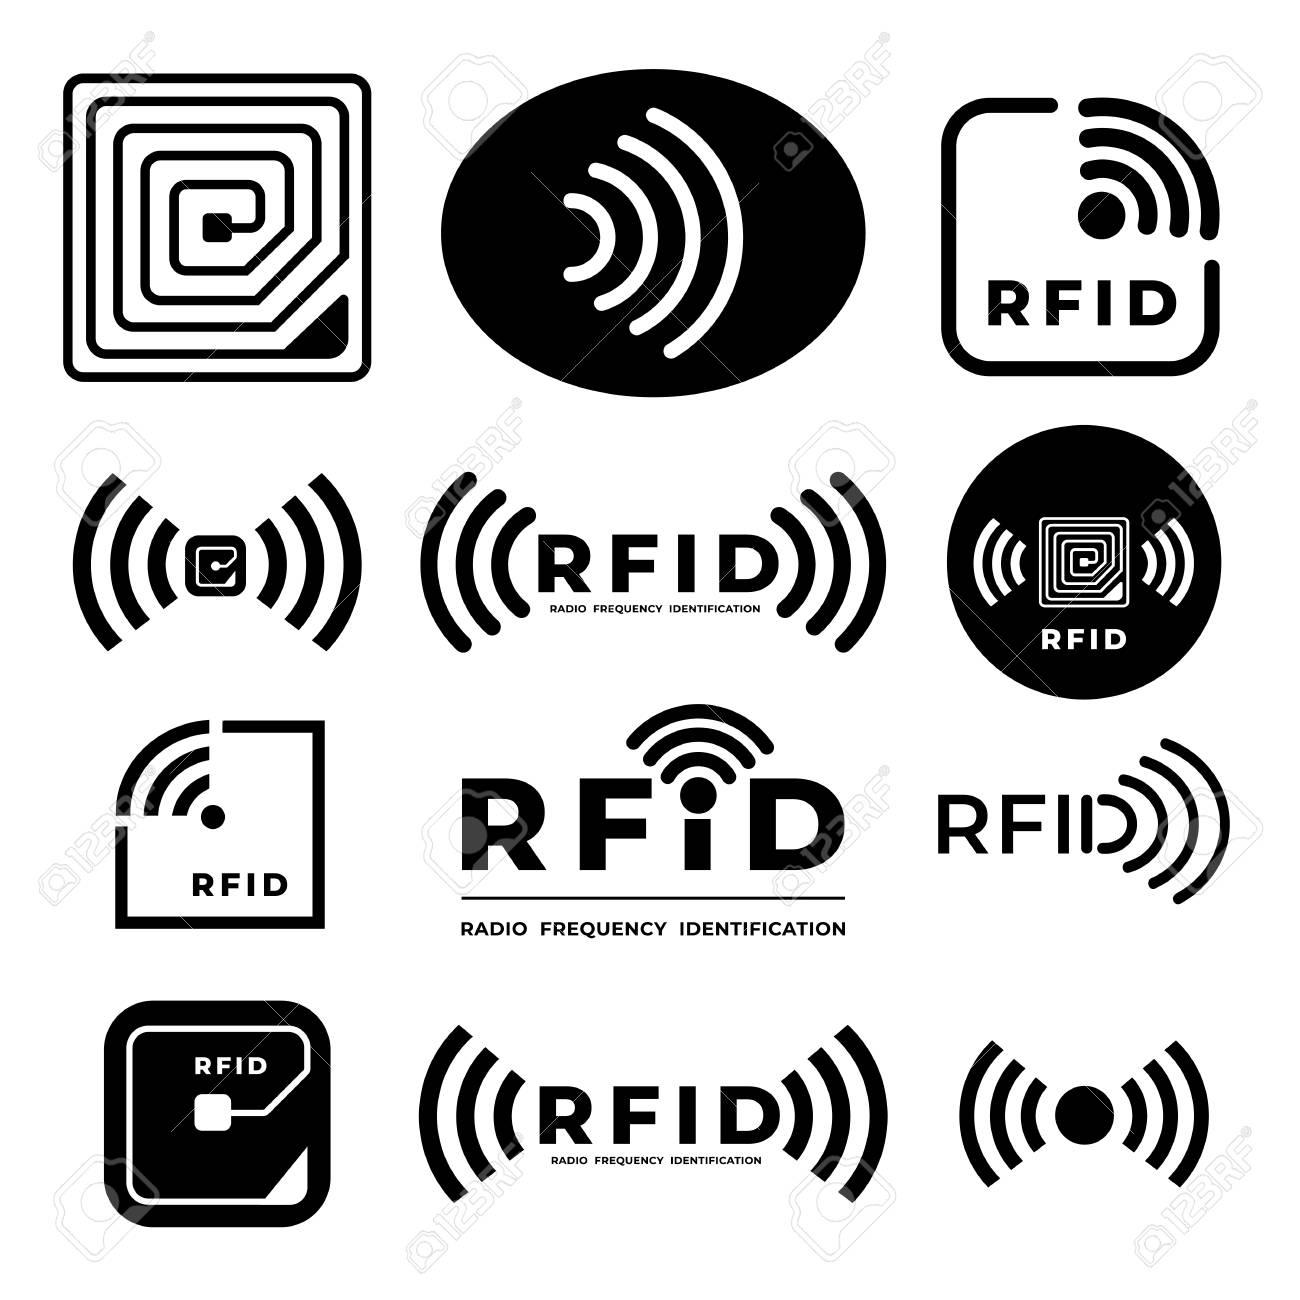 Vector set icon symbol concept RFID. radio frequency identification. illustrations - 116147470